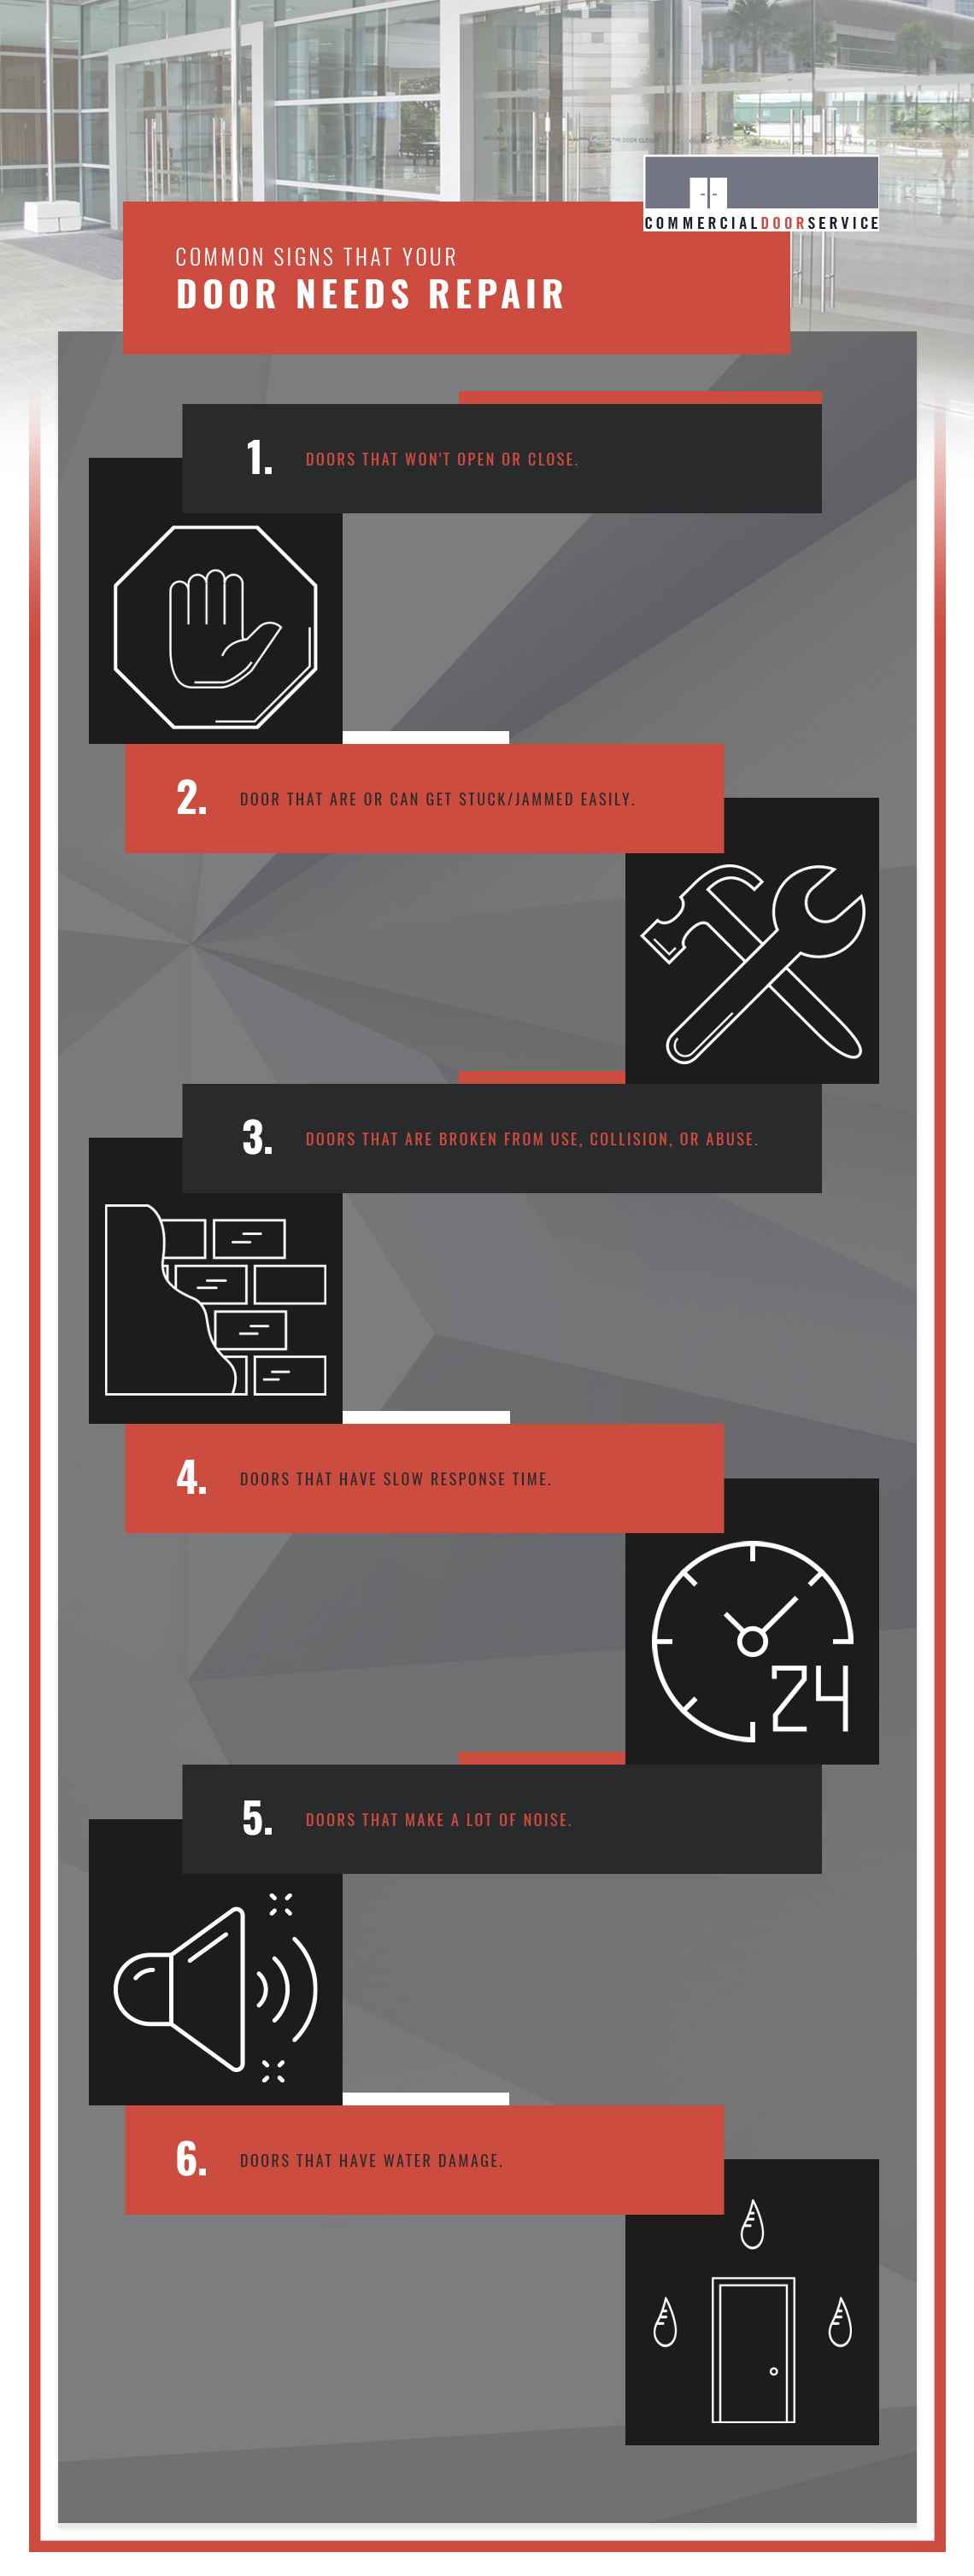 Common Signs The Your Door Needs Repair infographic.